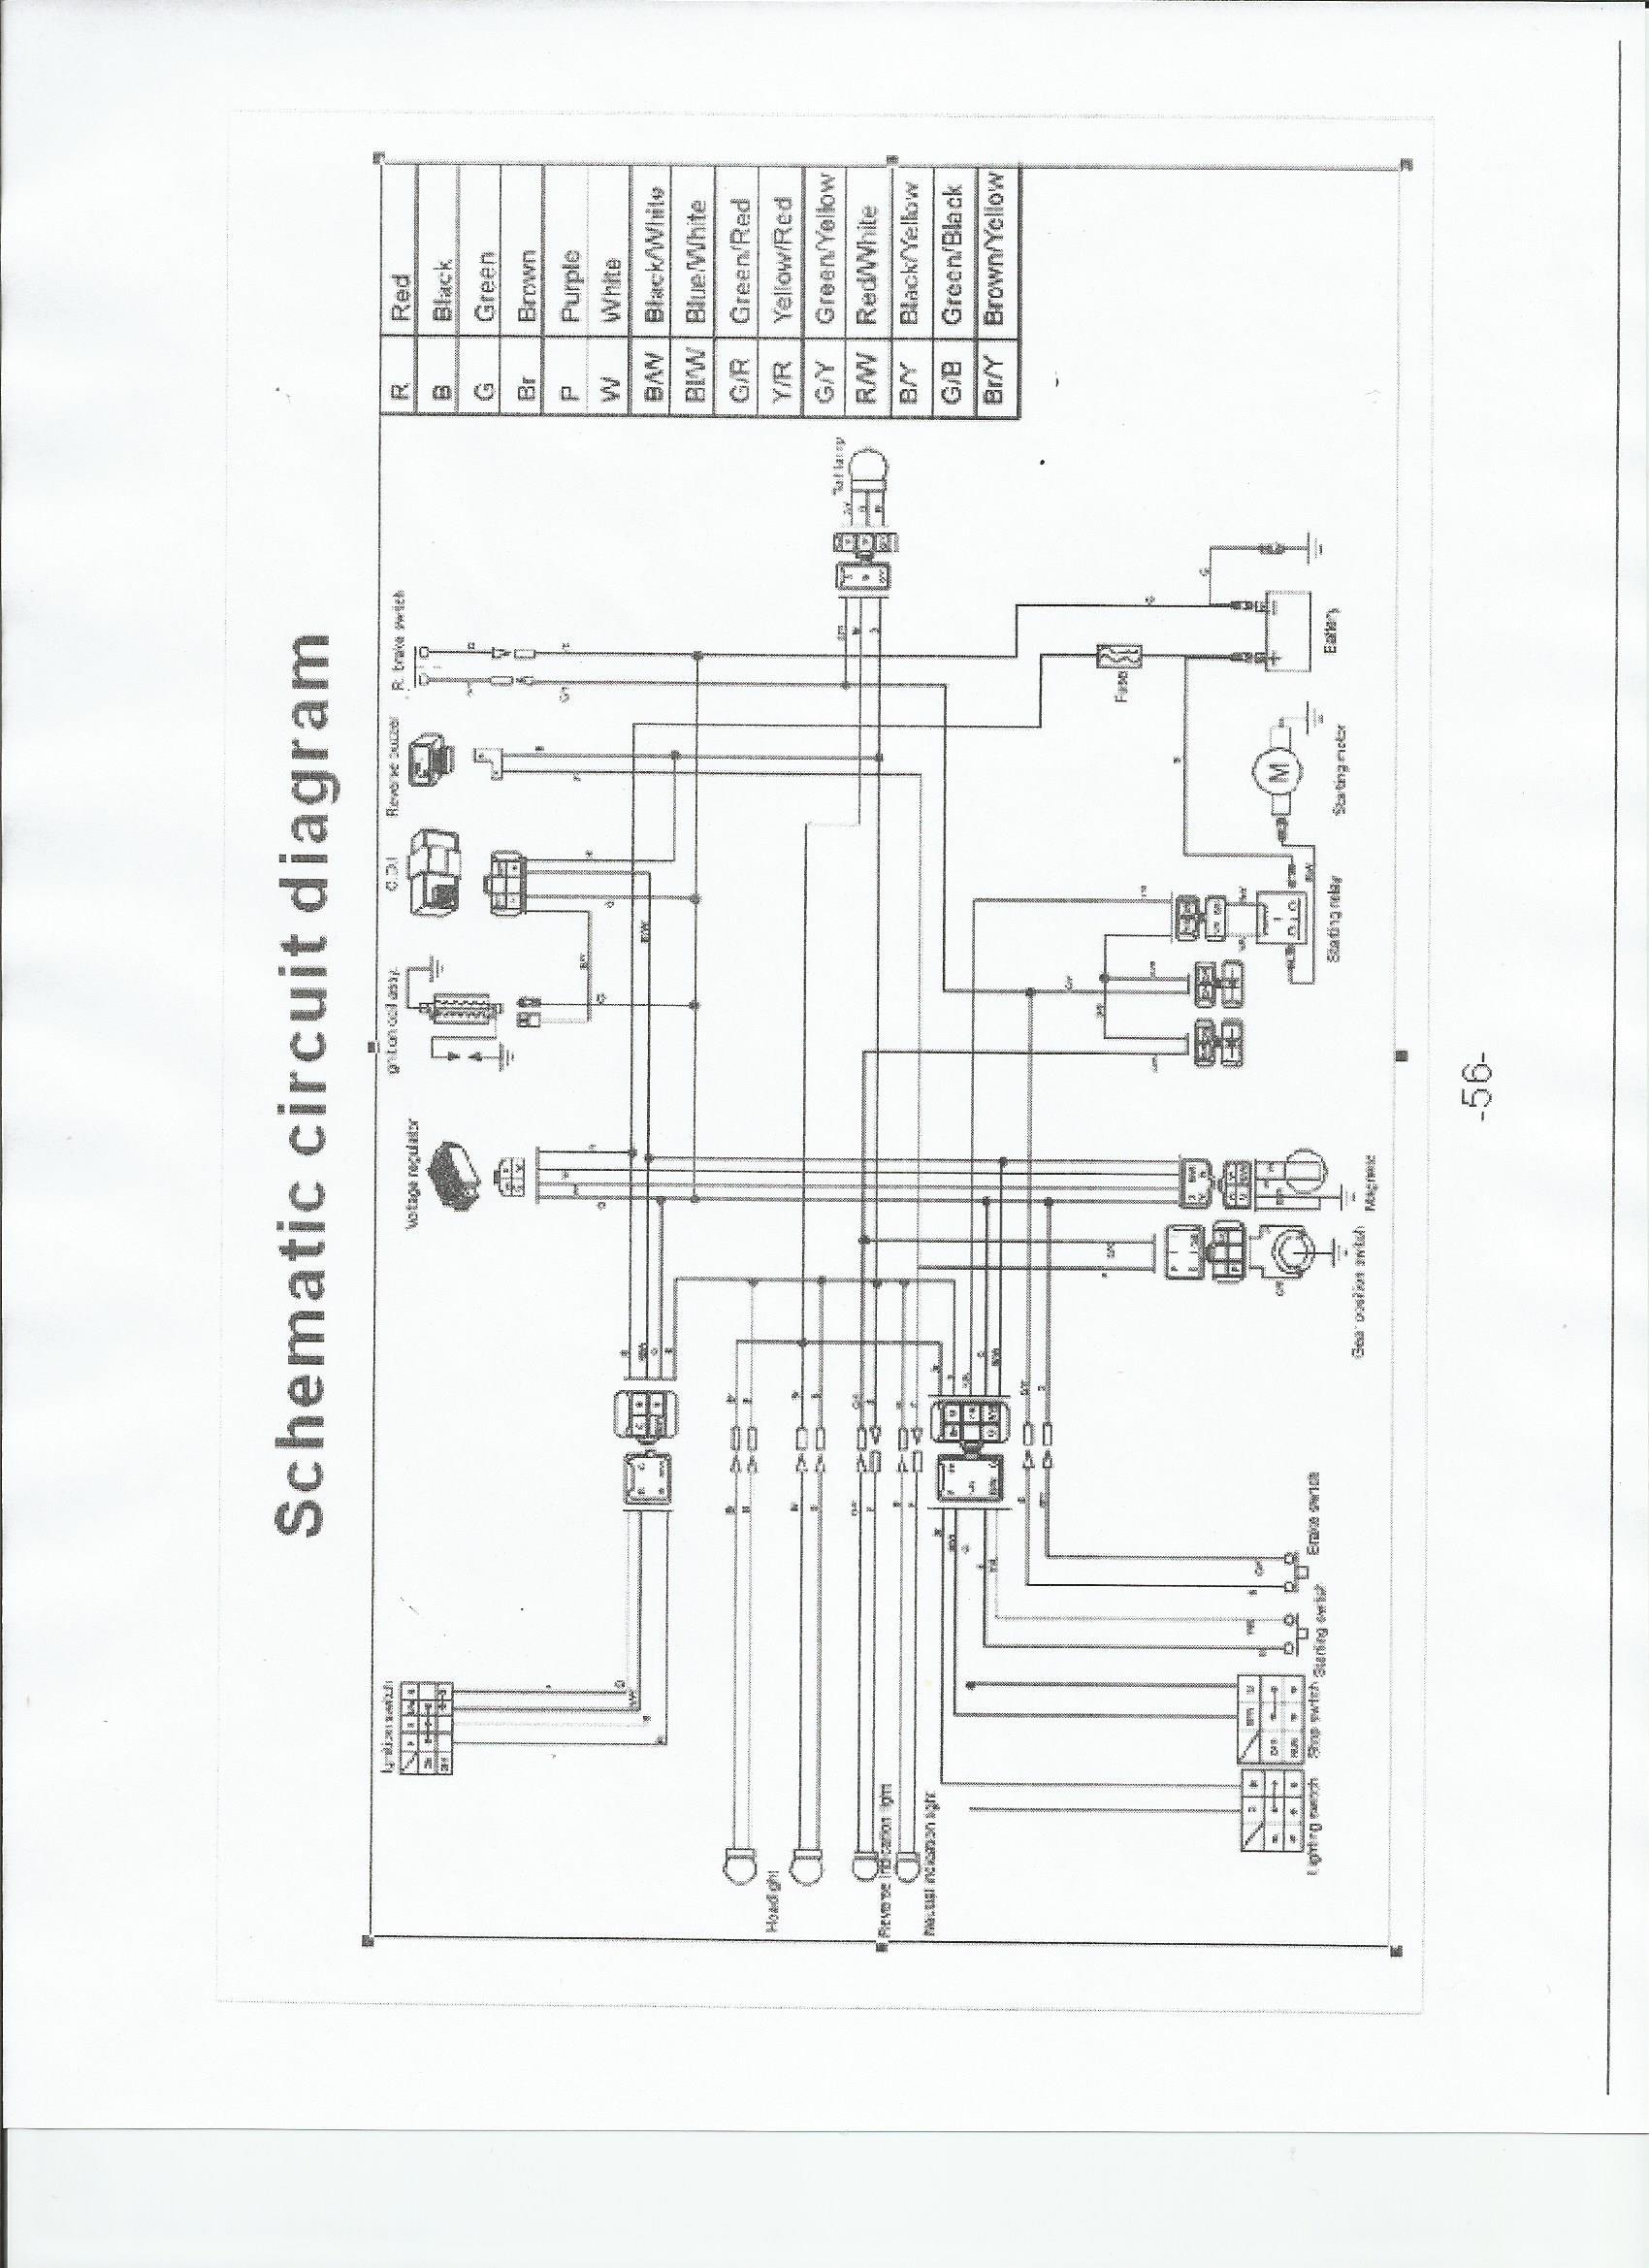 Wiring Diagram For Honda Xl 185 : Honda atc wiring diagram imageresizertool